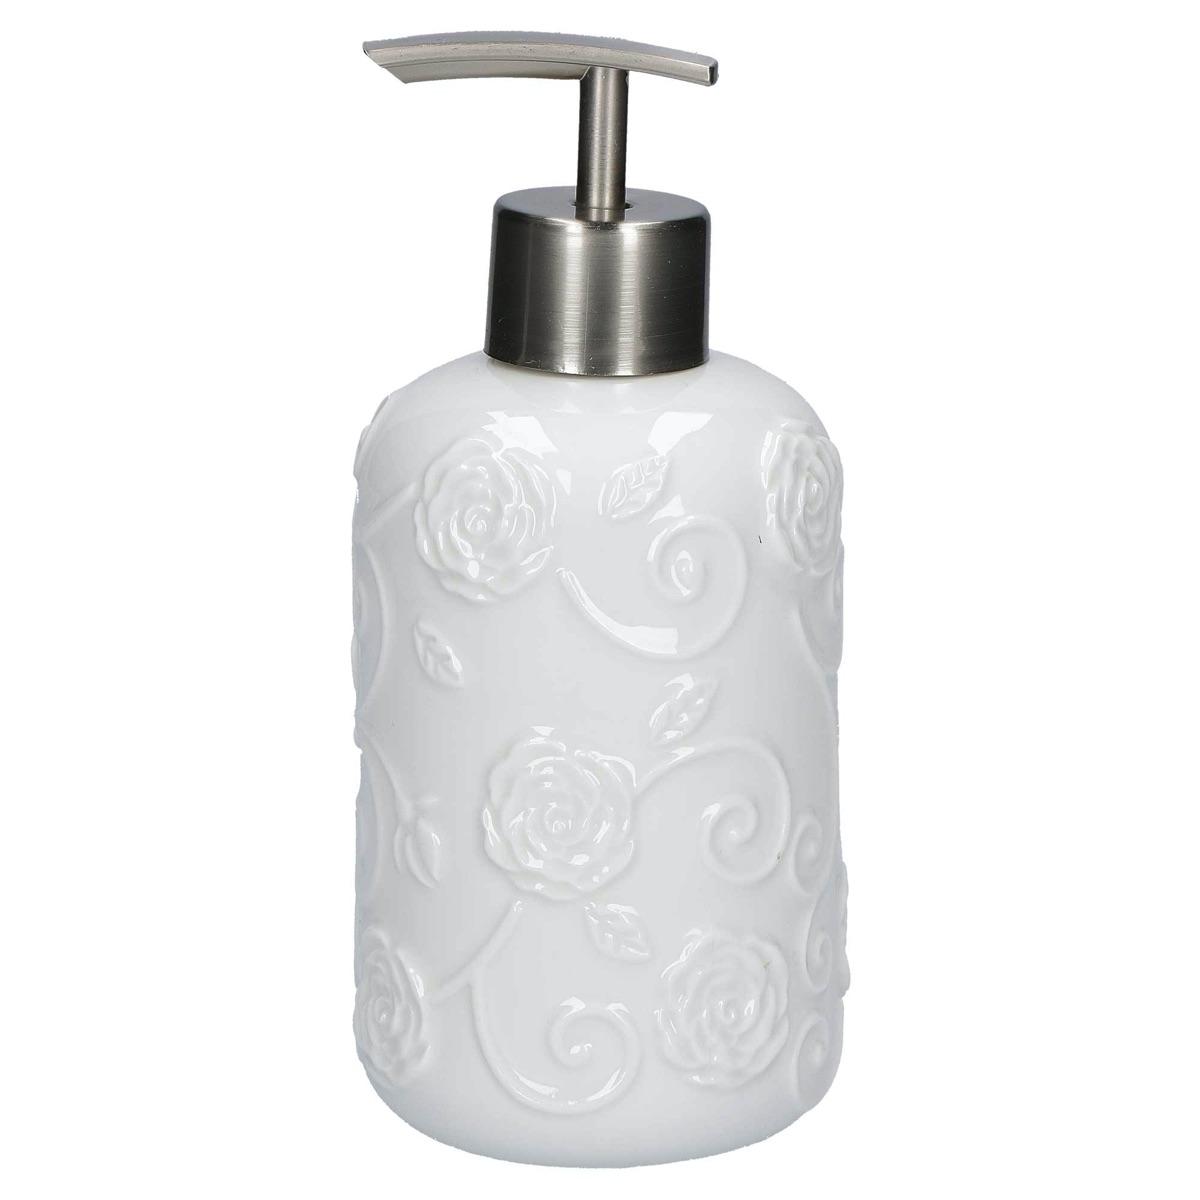 Dispenser sapone liquido Tivoli